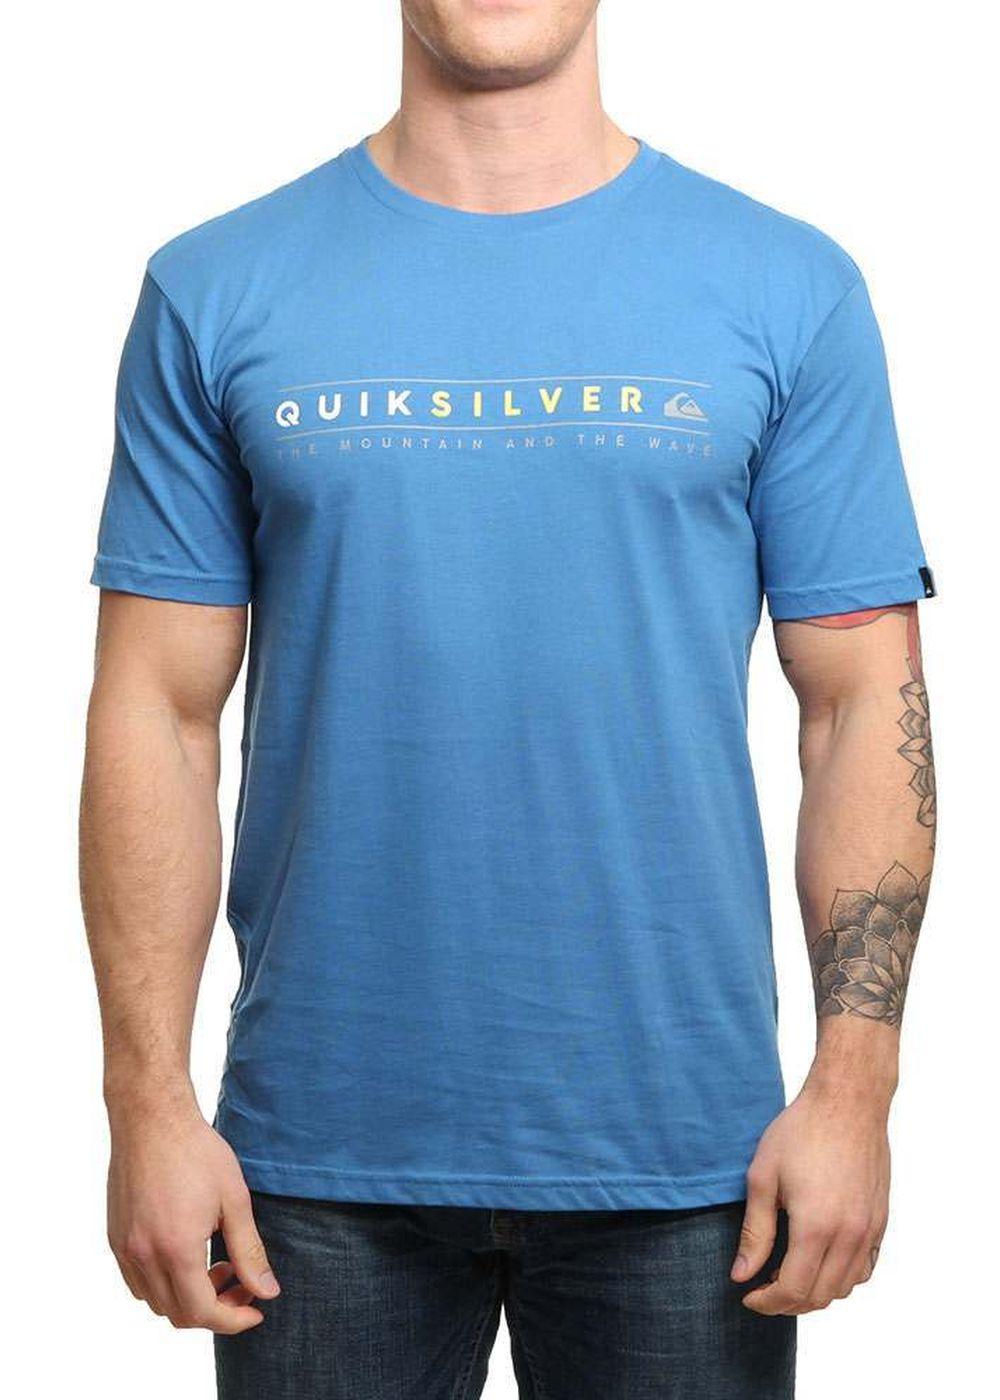 quiksilver-always-clean-tee-vallarta-blue